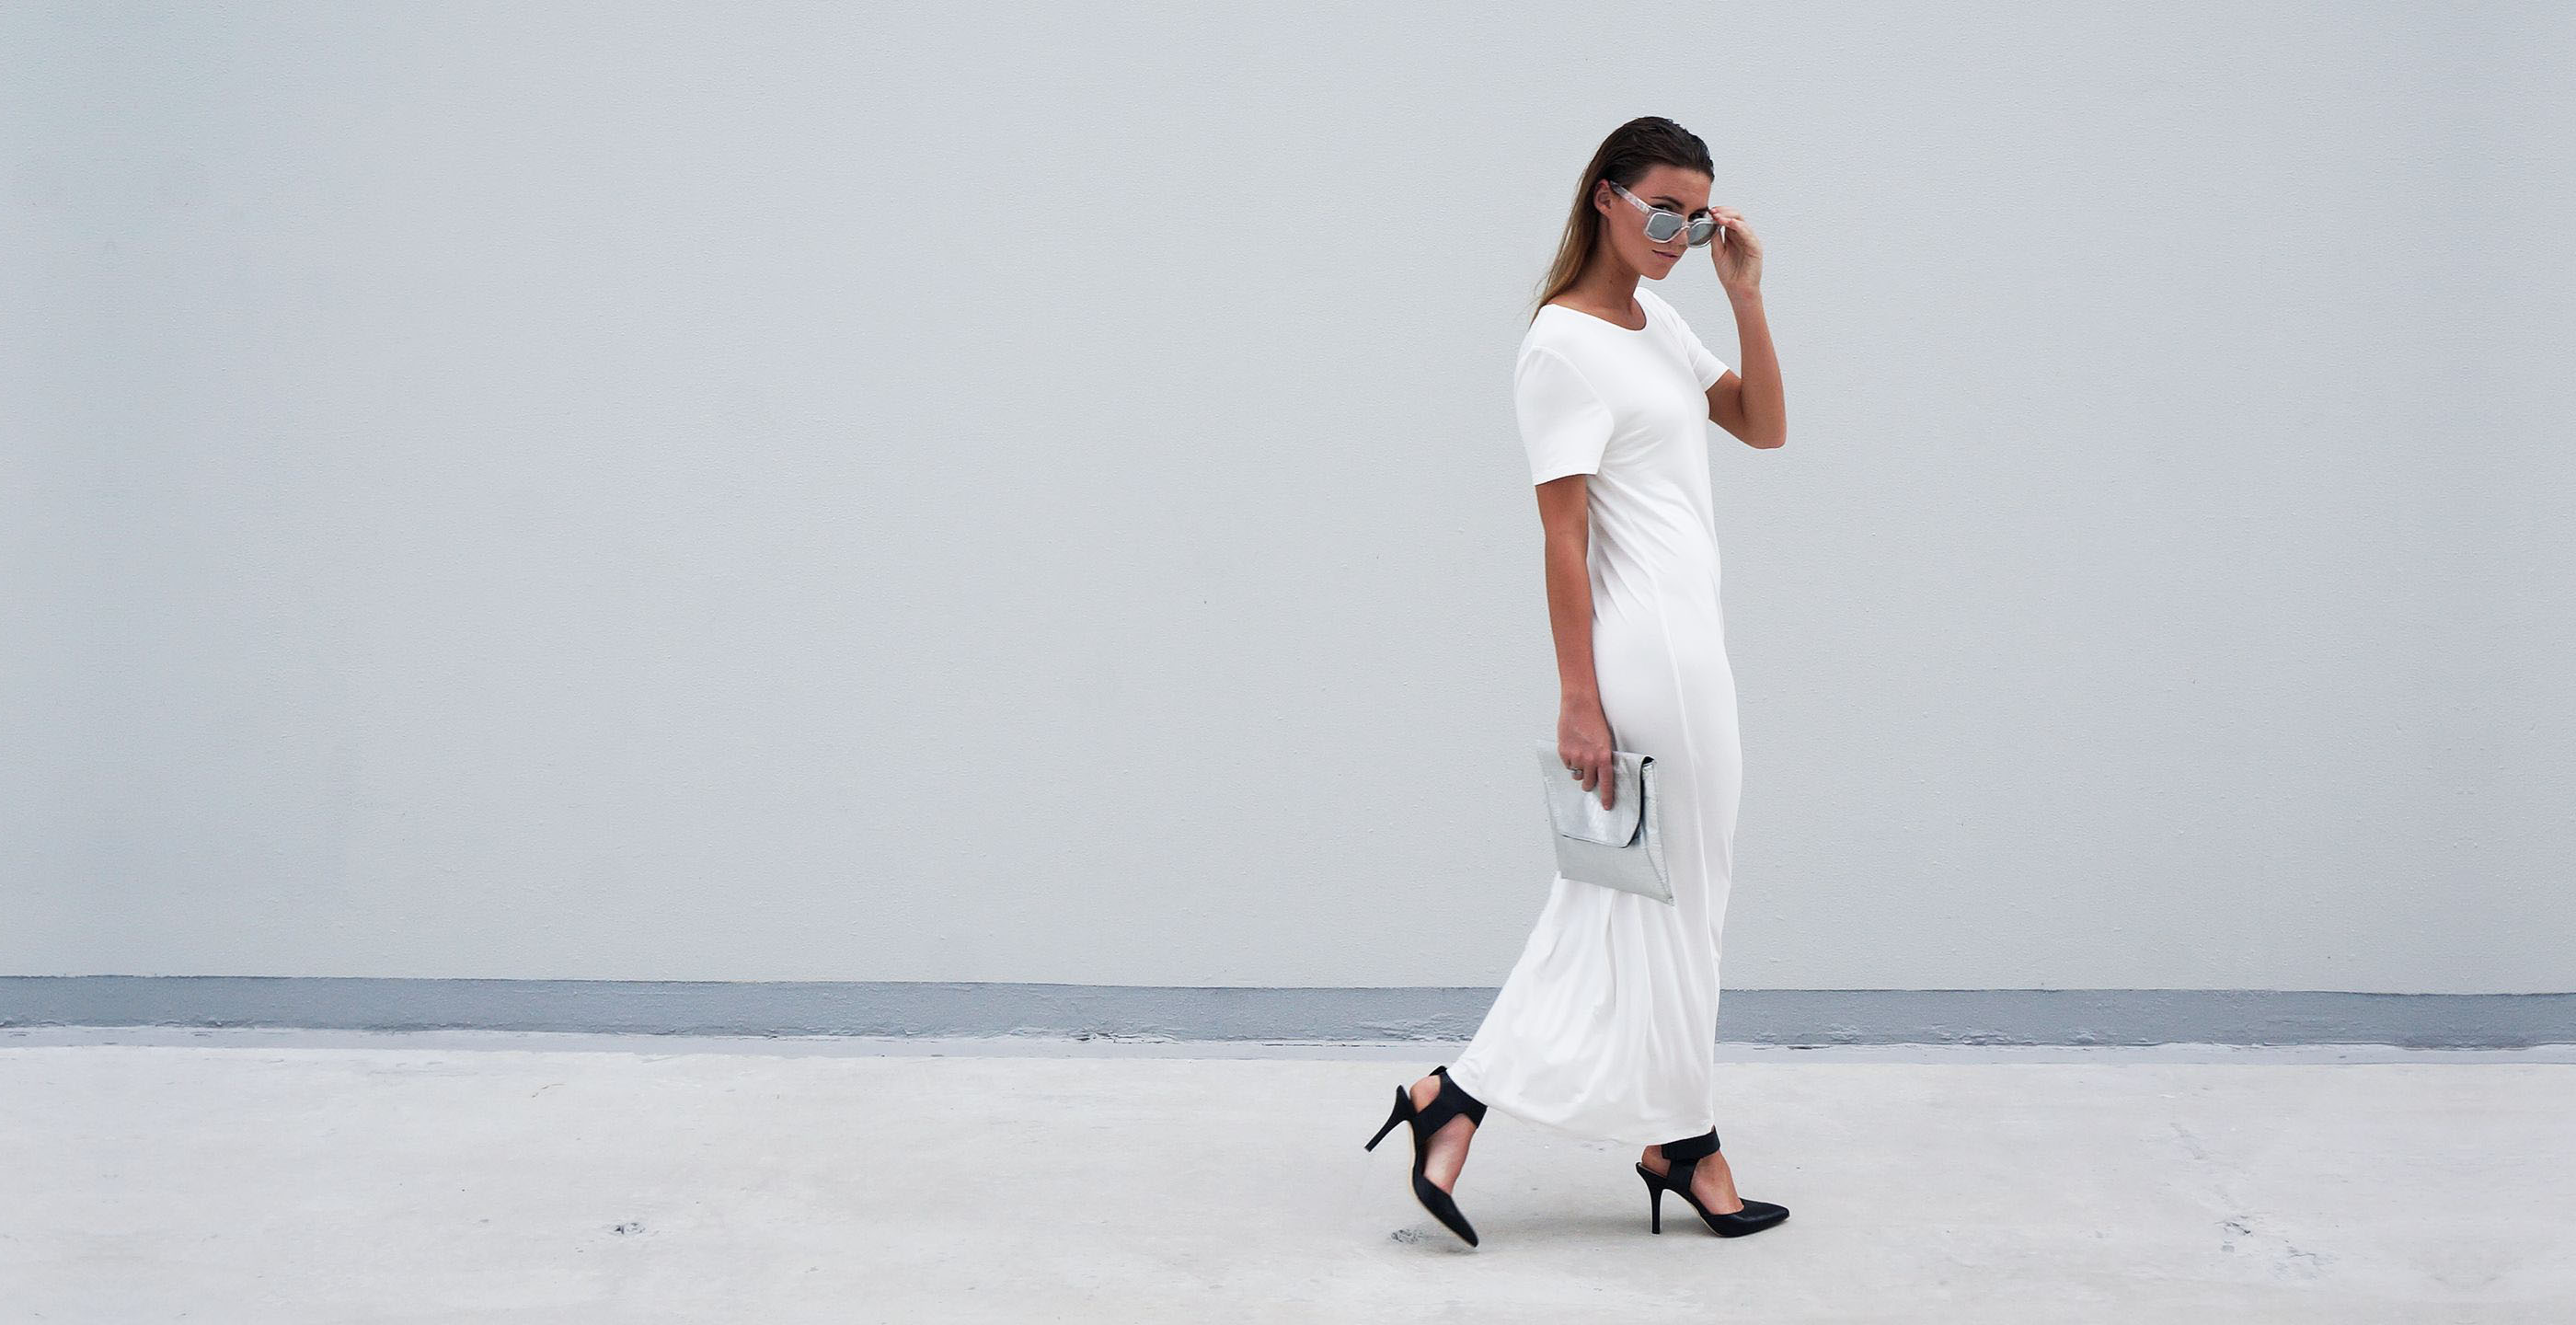 Bamboo Jersey Eco Friendly Fashion Short Sleeve Maxi Dress White